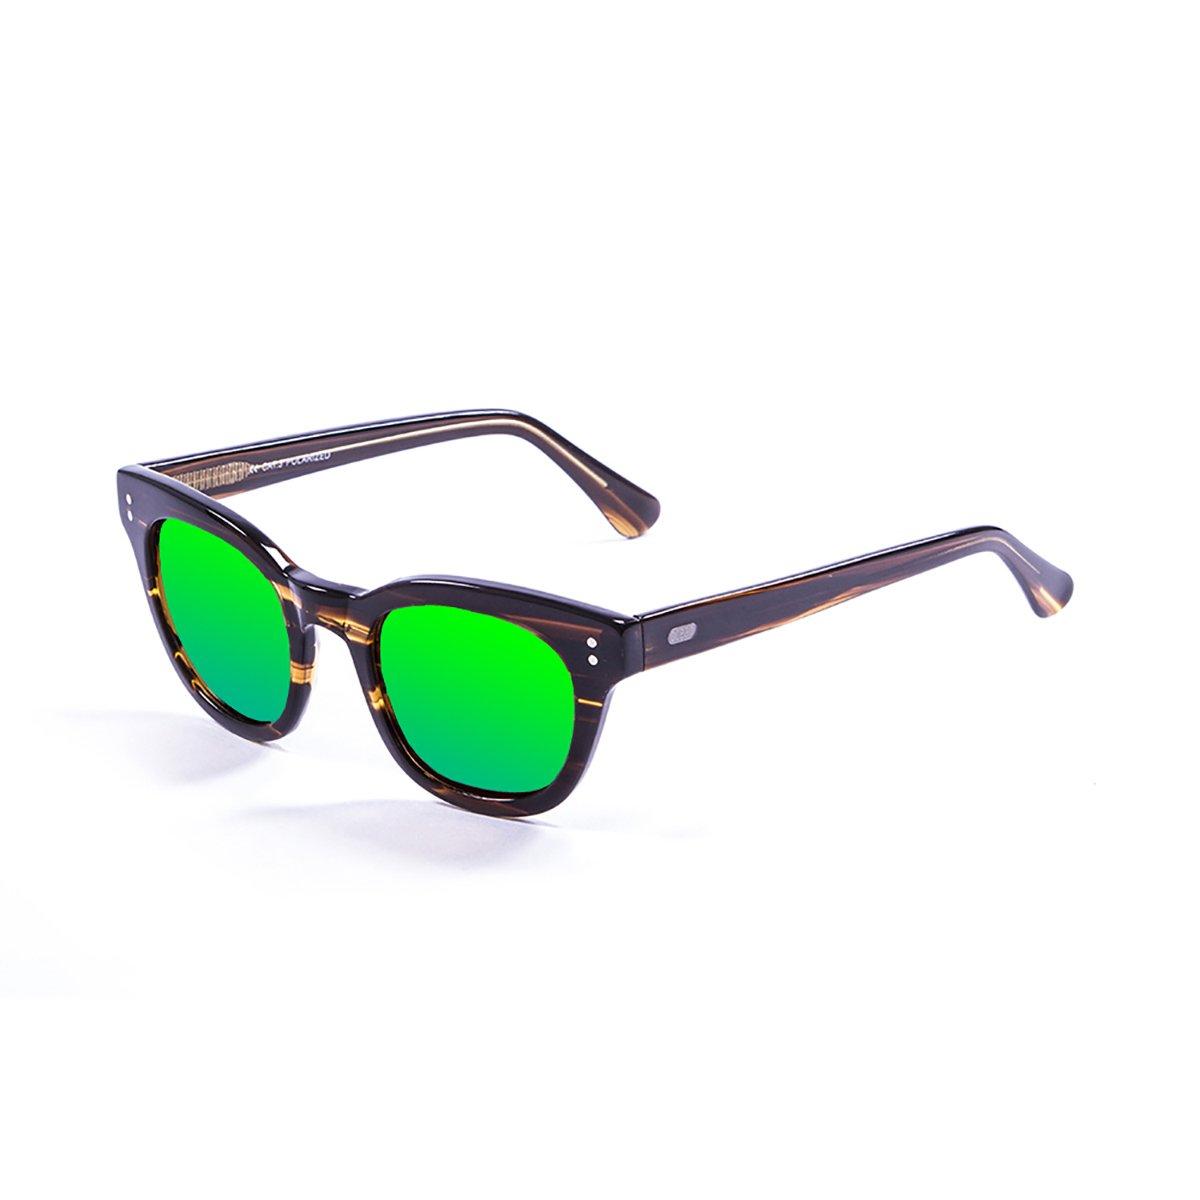 Ocean Sunglasses Ski Gafas de Sol Polarized Santa Cruz (47 ...